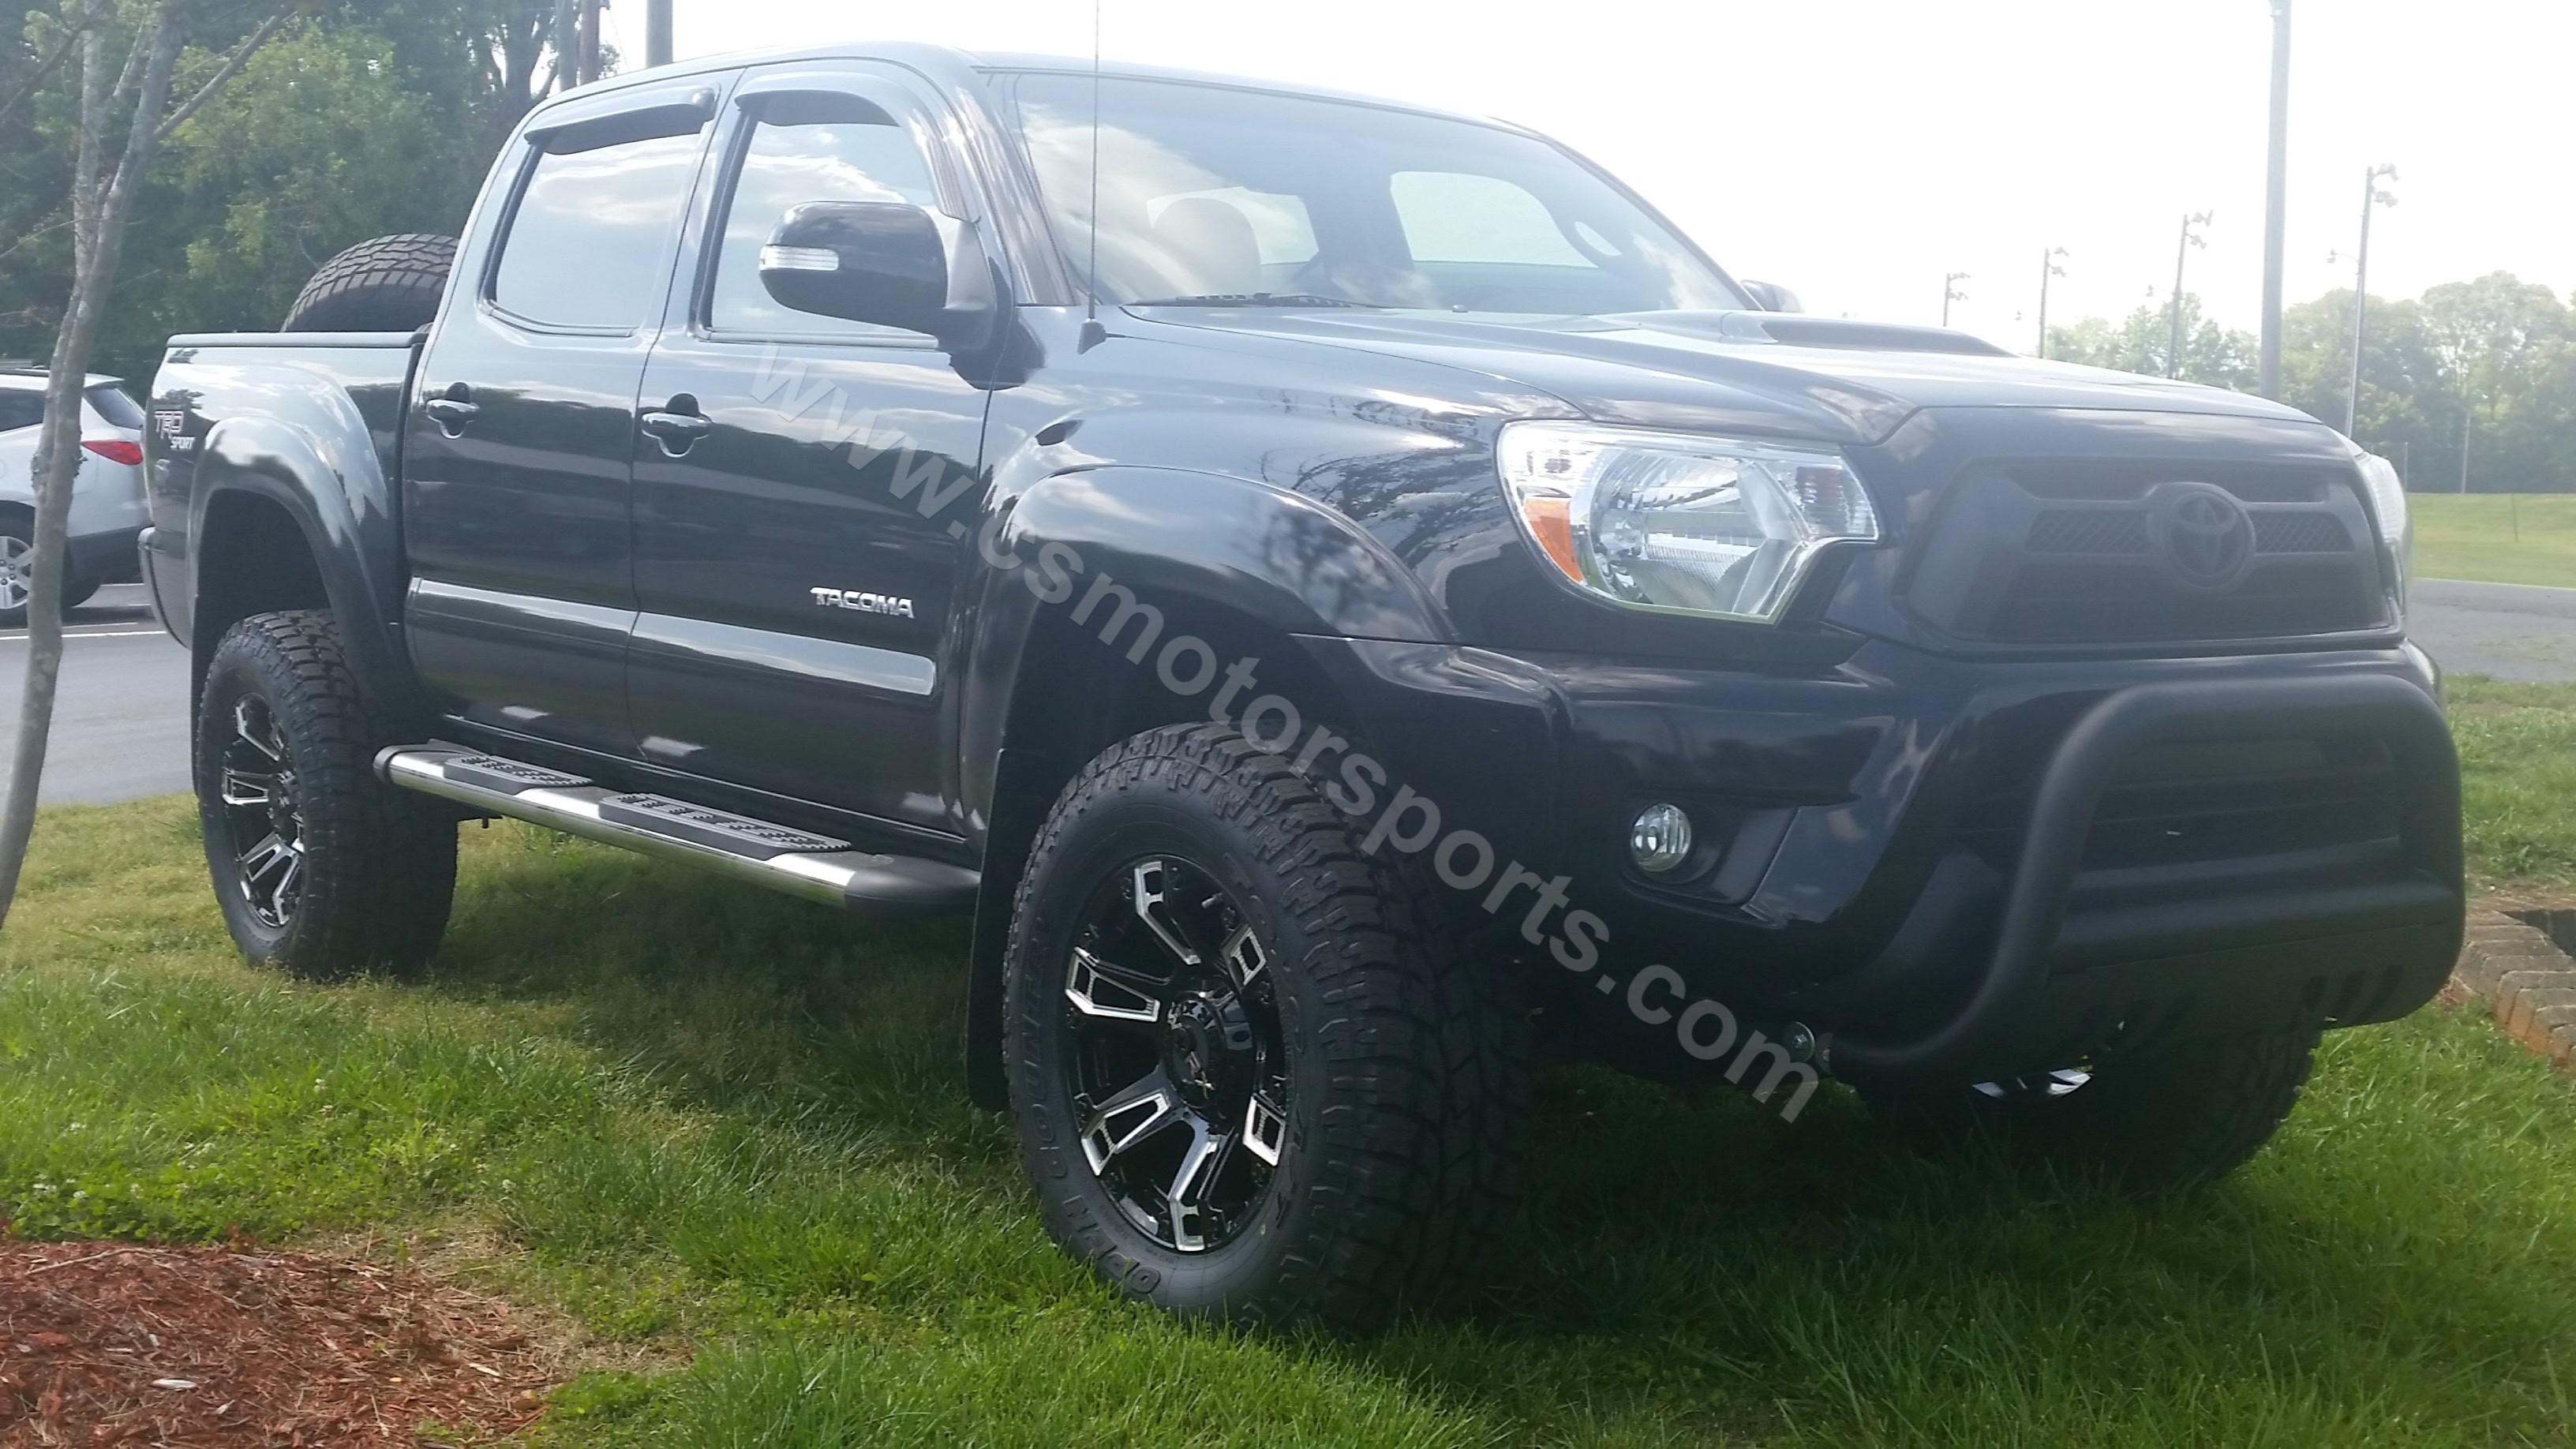 2013 Toyota Tacoma TRD Sport (920)